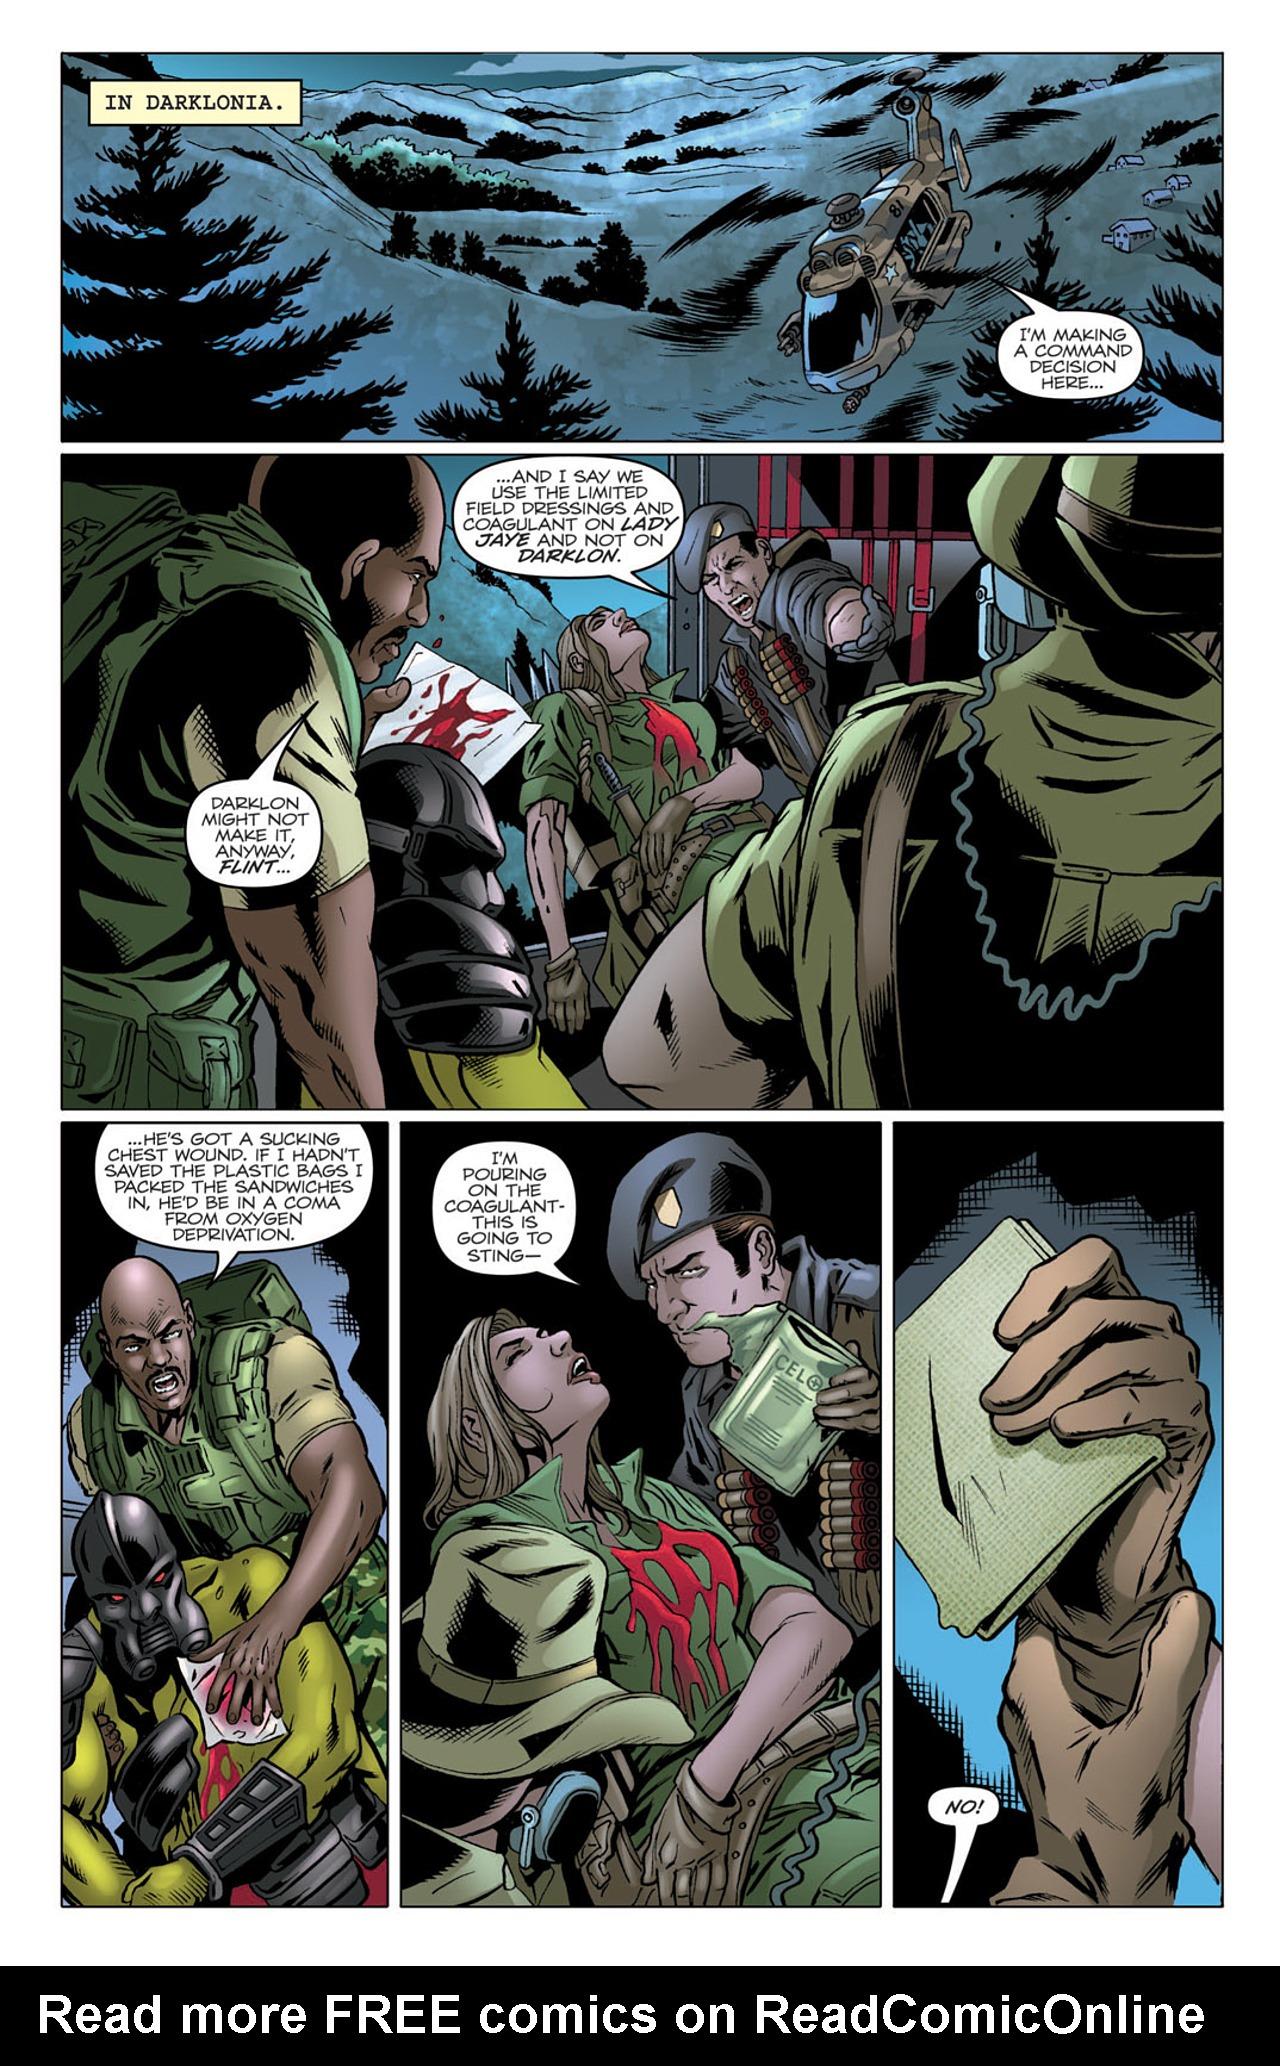 G.I. Joe: A Real American Hero 172 Page 8